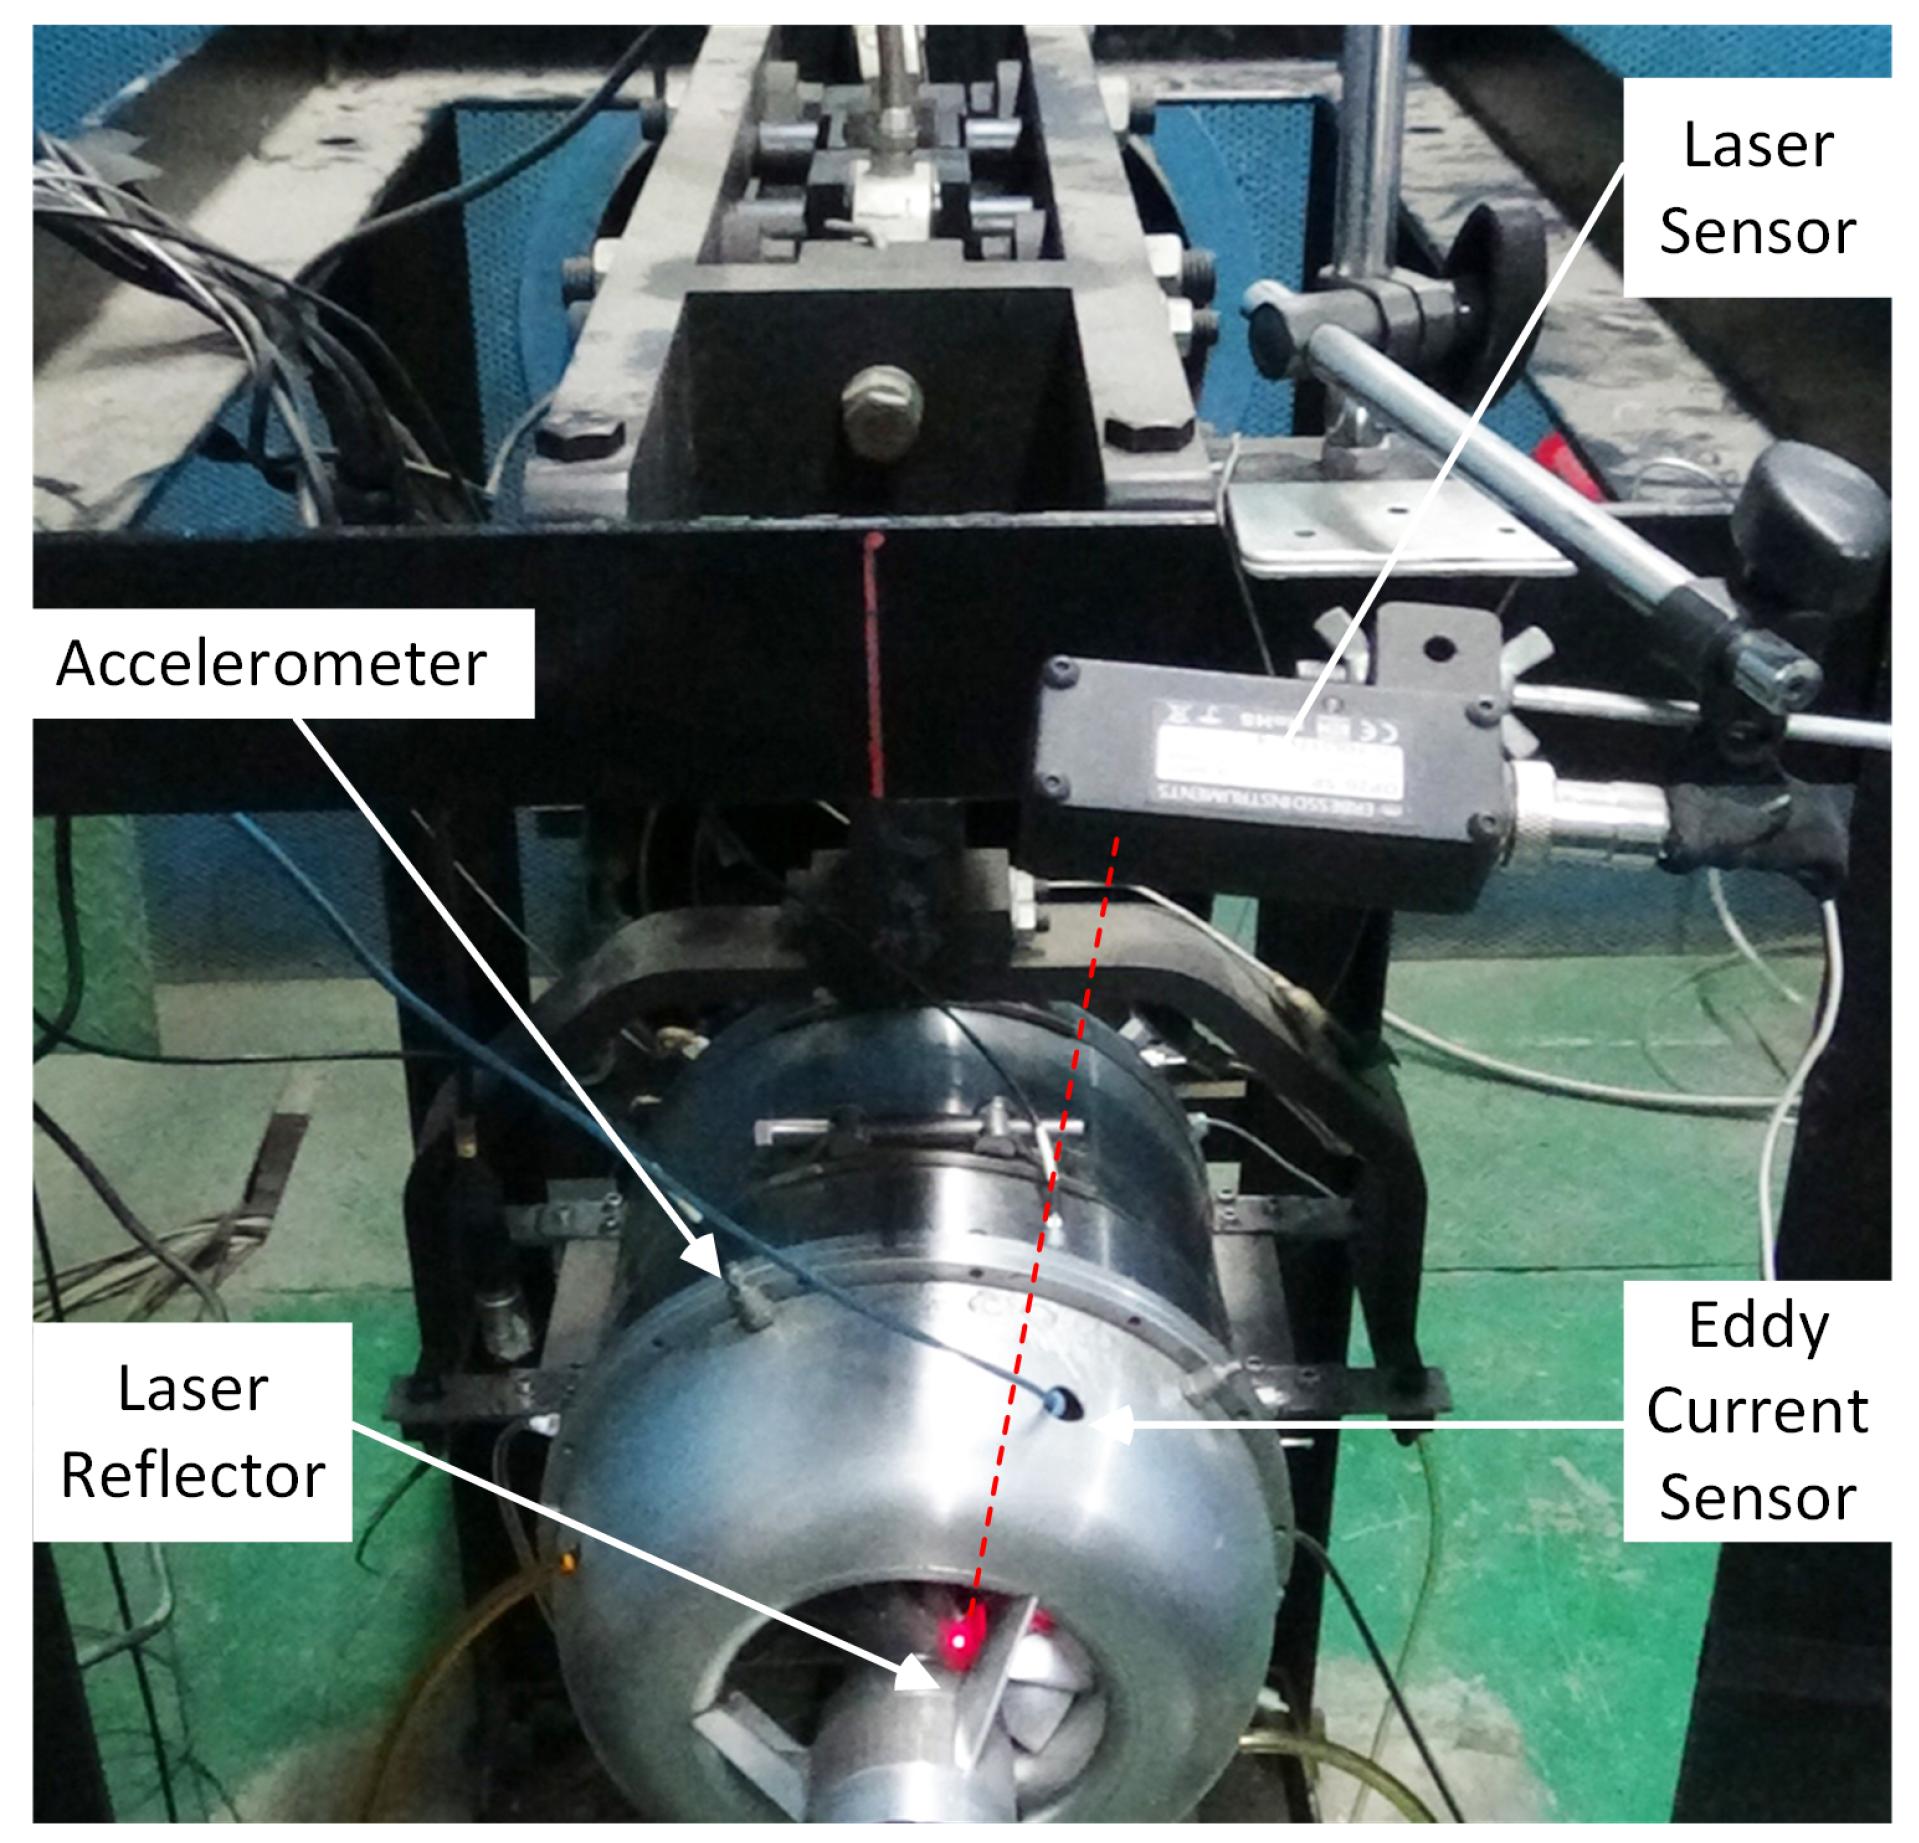 Sensors | Free Full-Text | Eddy Current Sensor System for Blade Tip